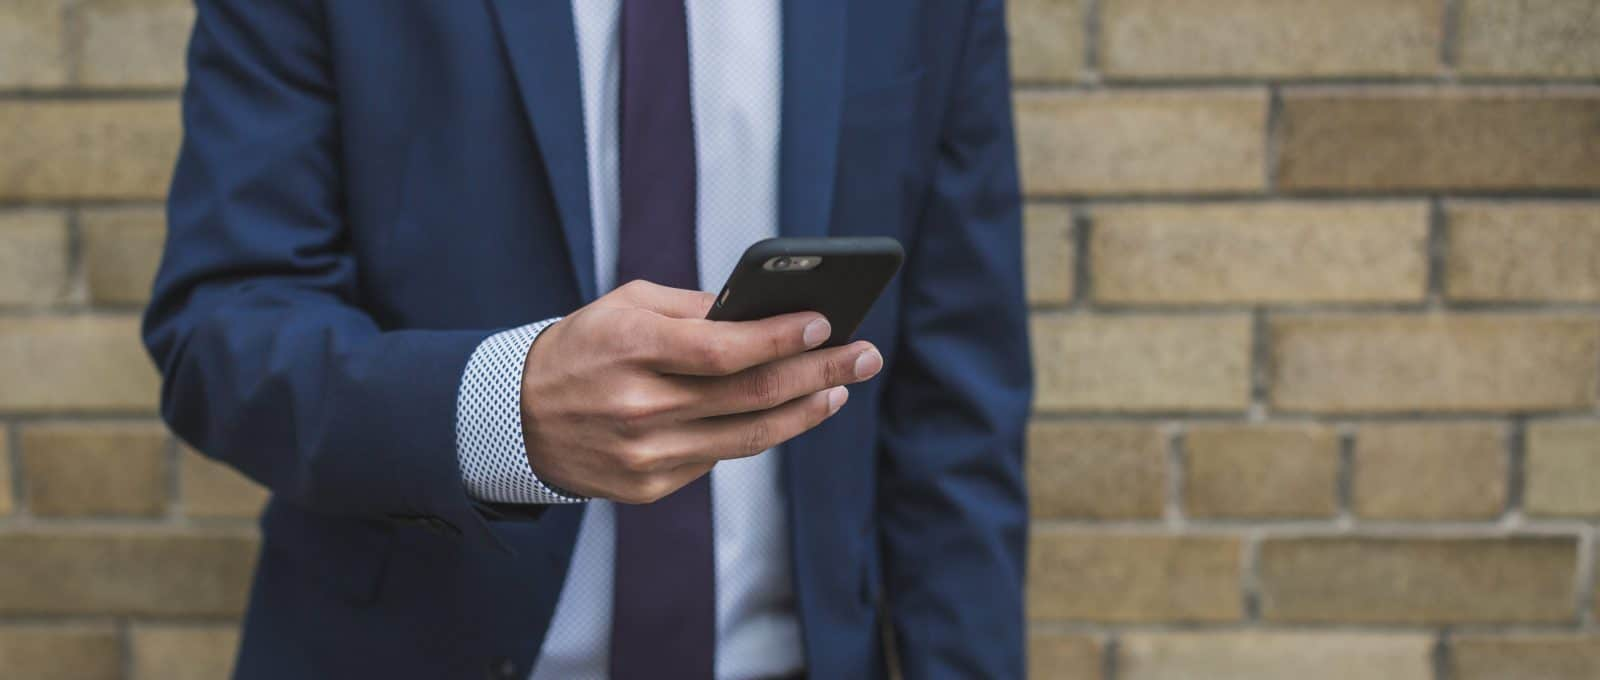 Quel smartphone pliable choisir ?